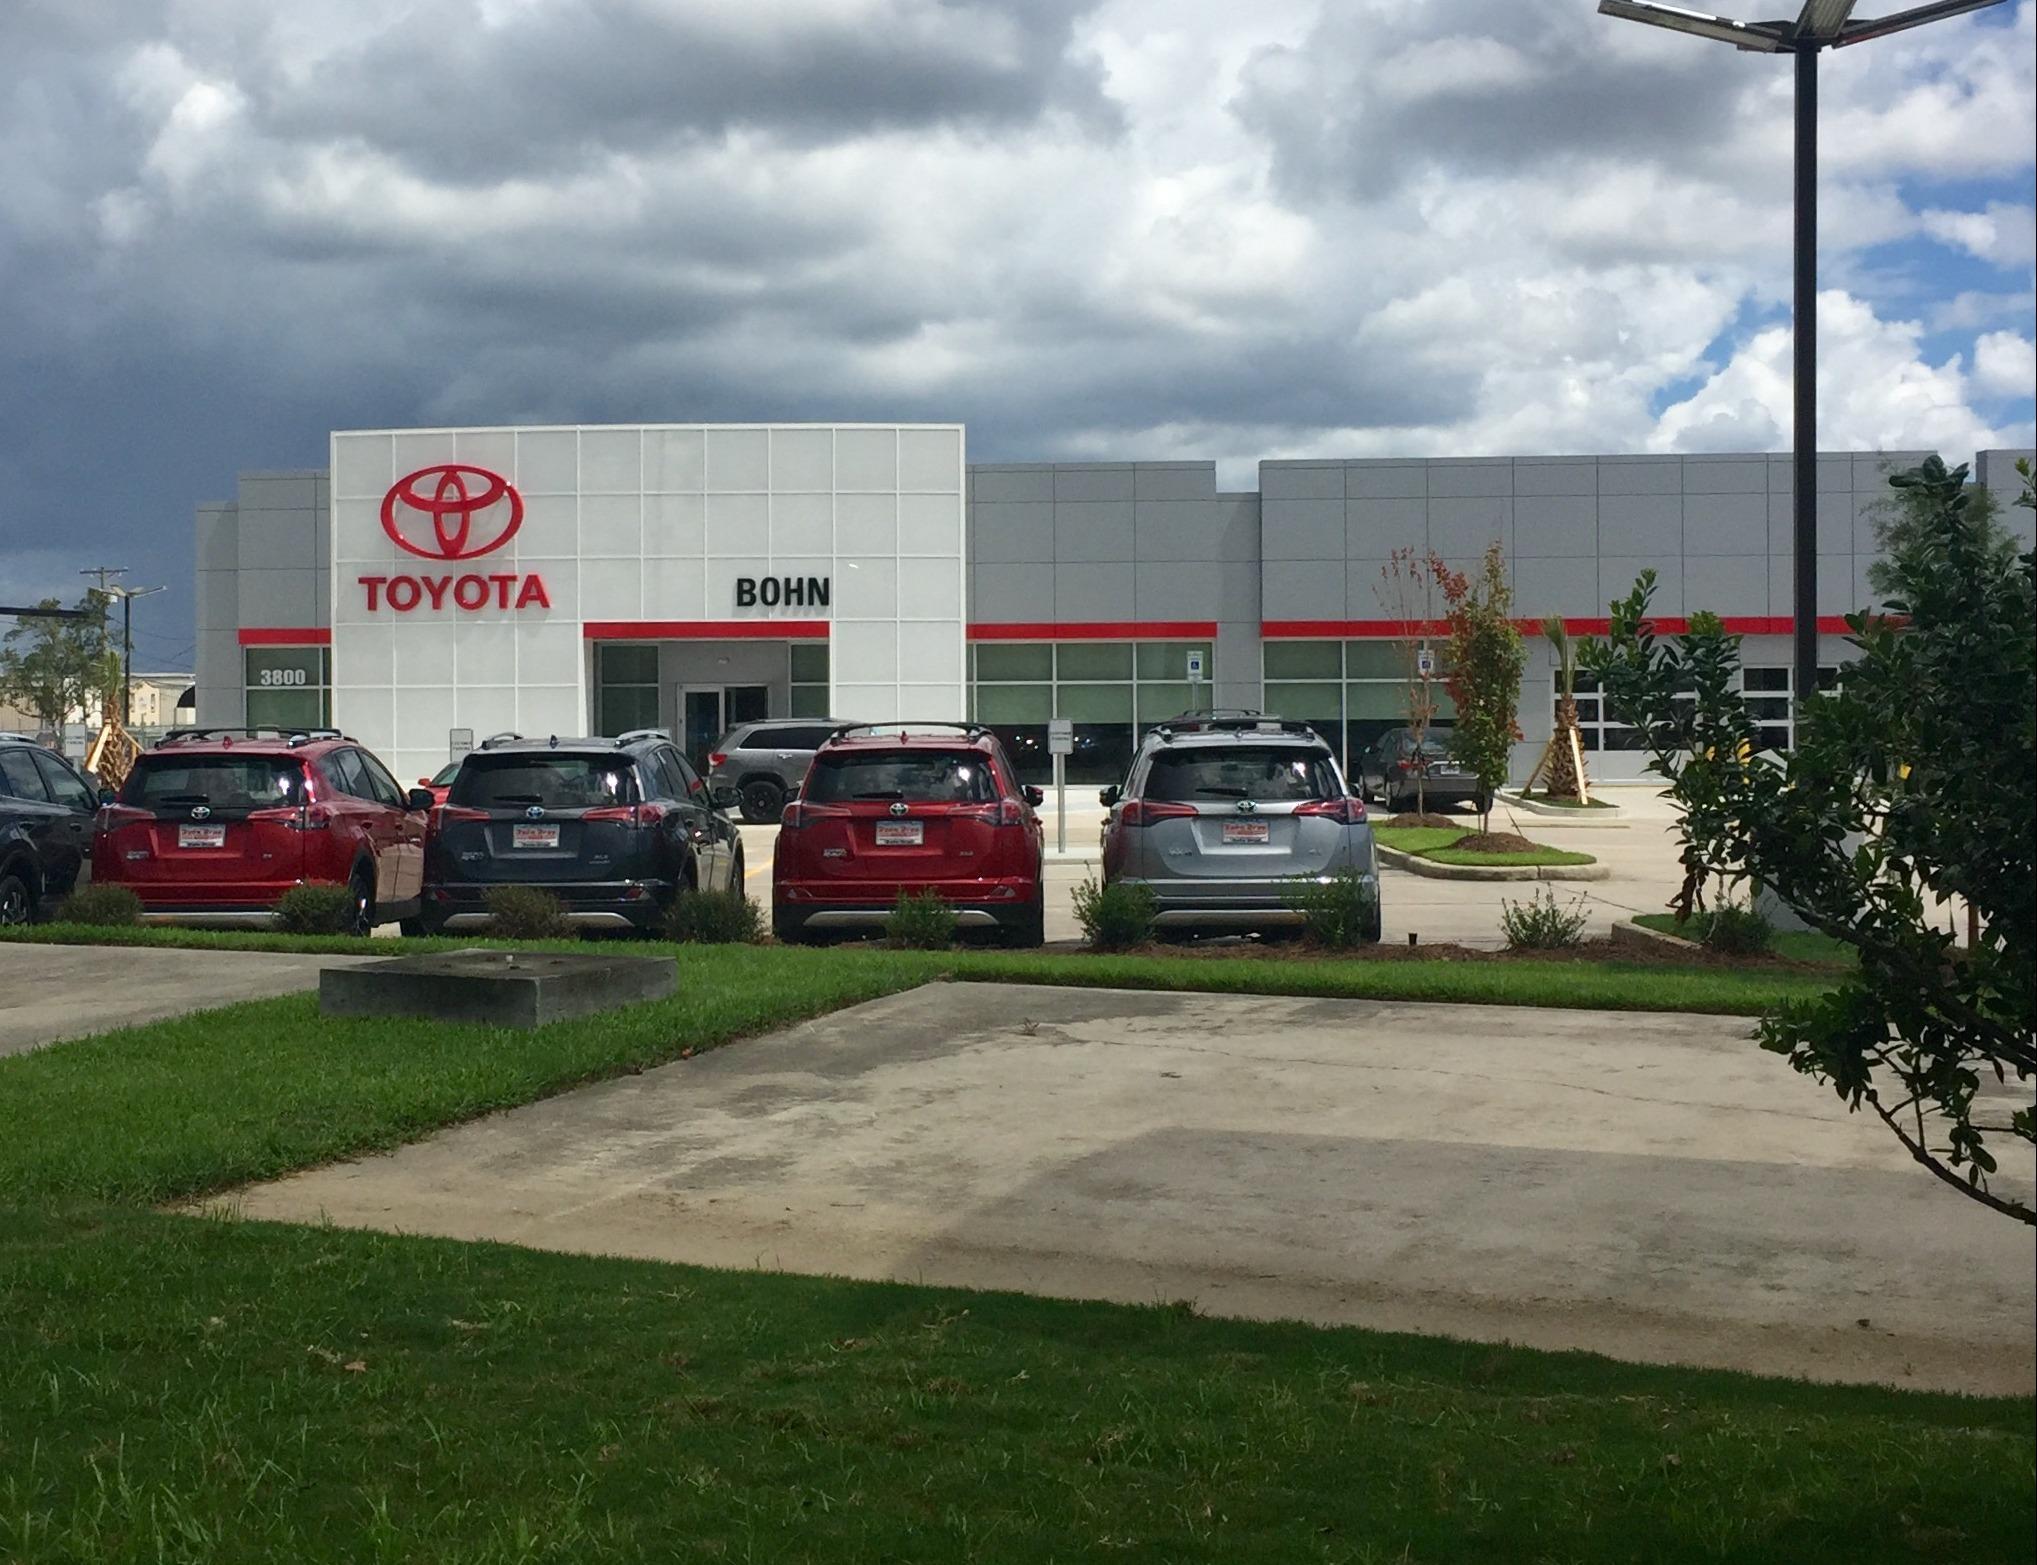 Bohn Toyota in Harvey, LA 70058 - ChamberofCommerce.com